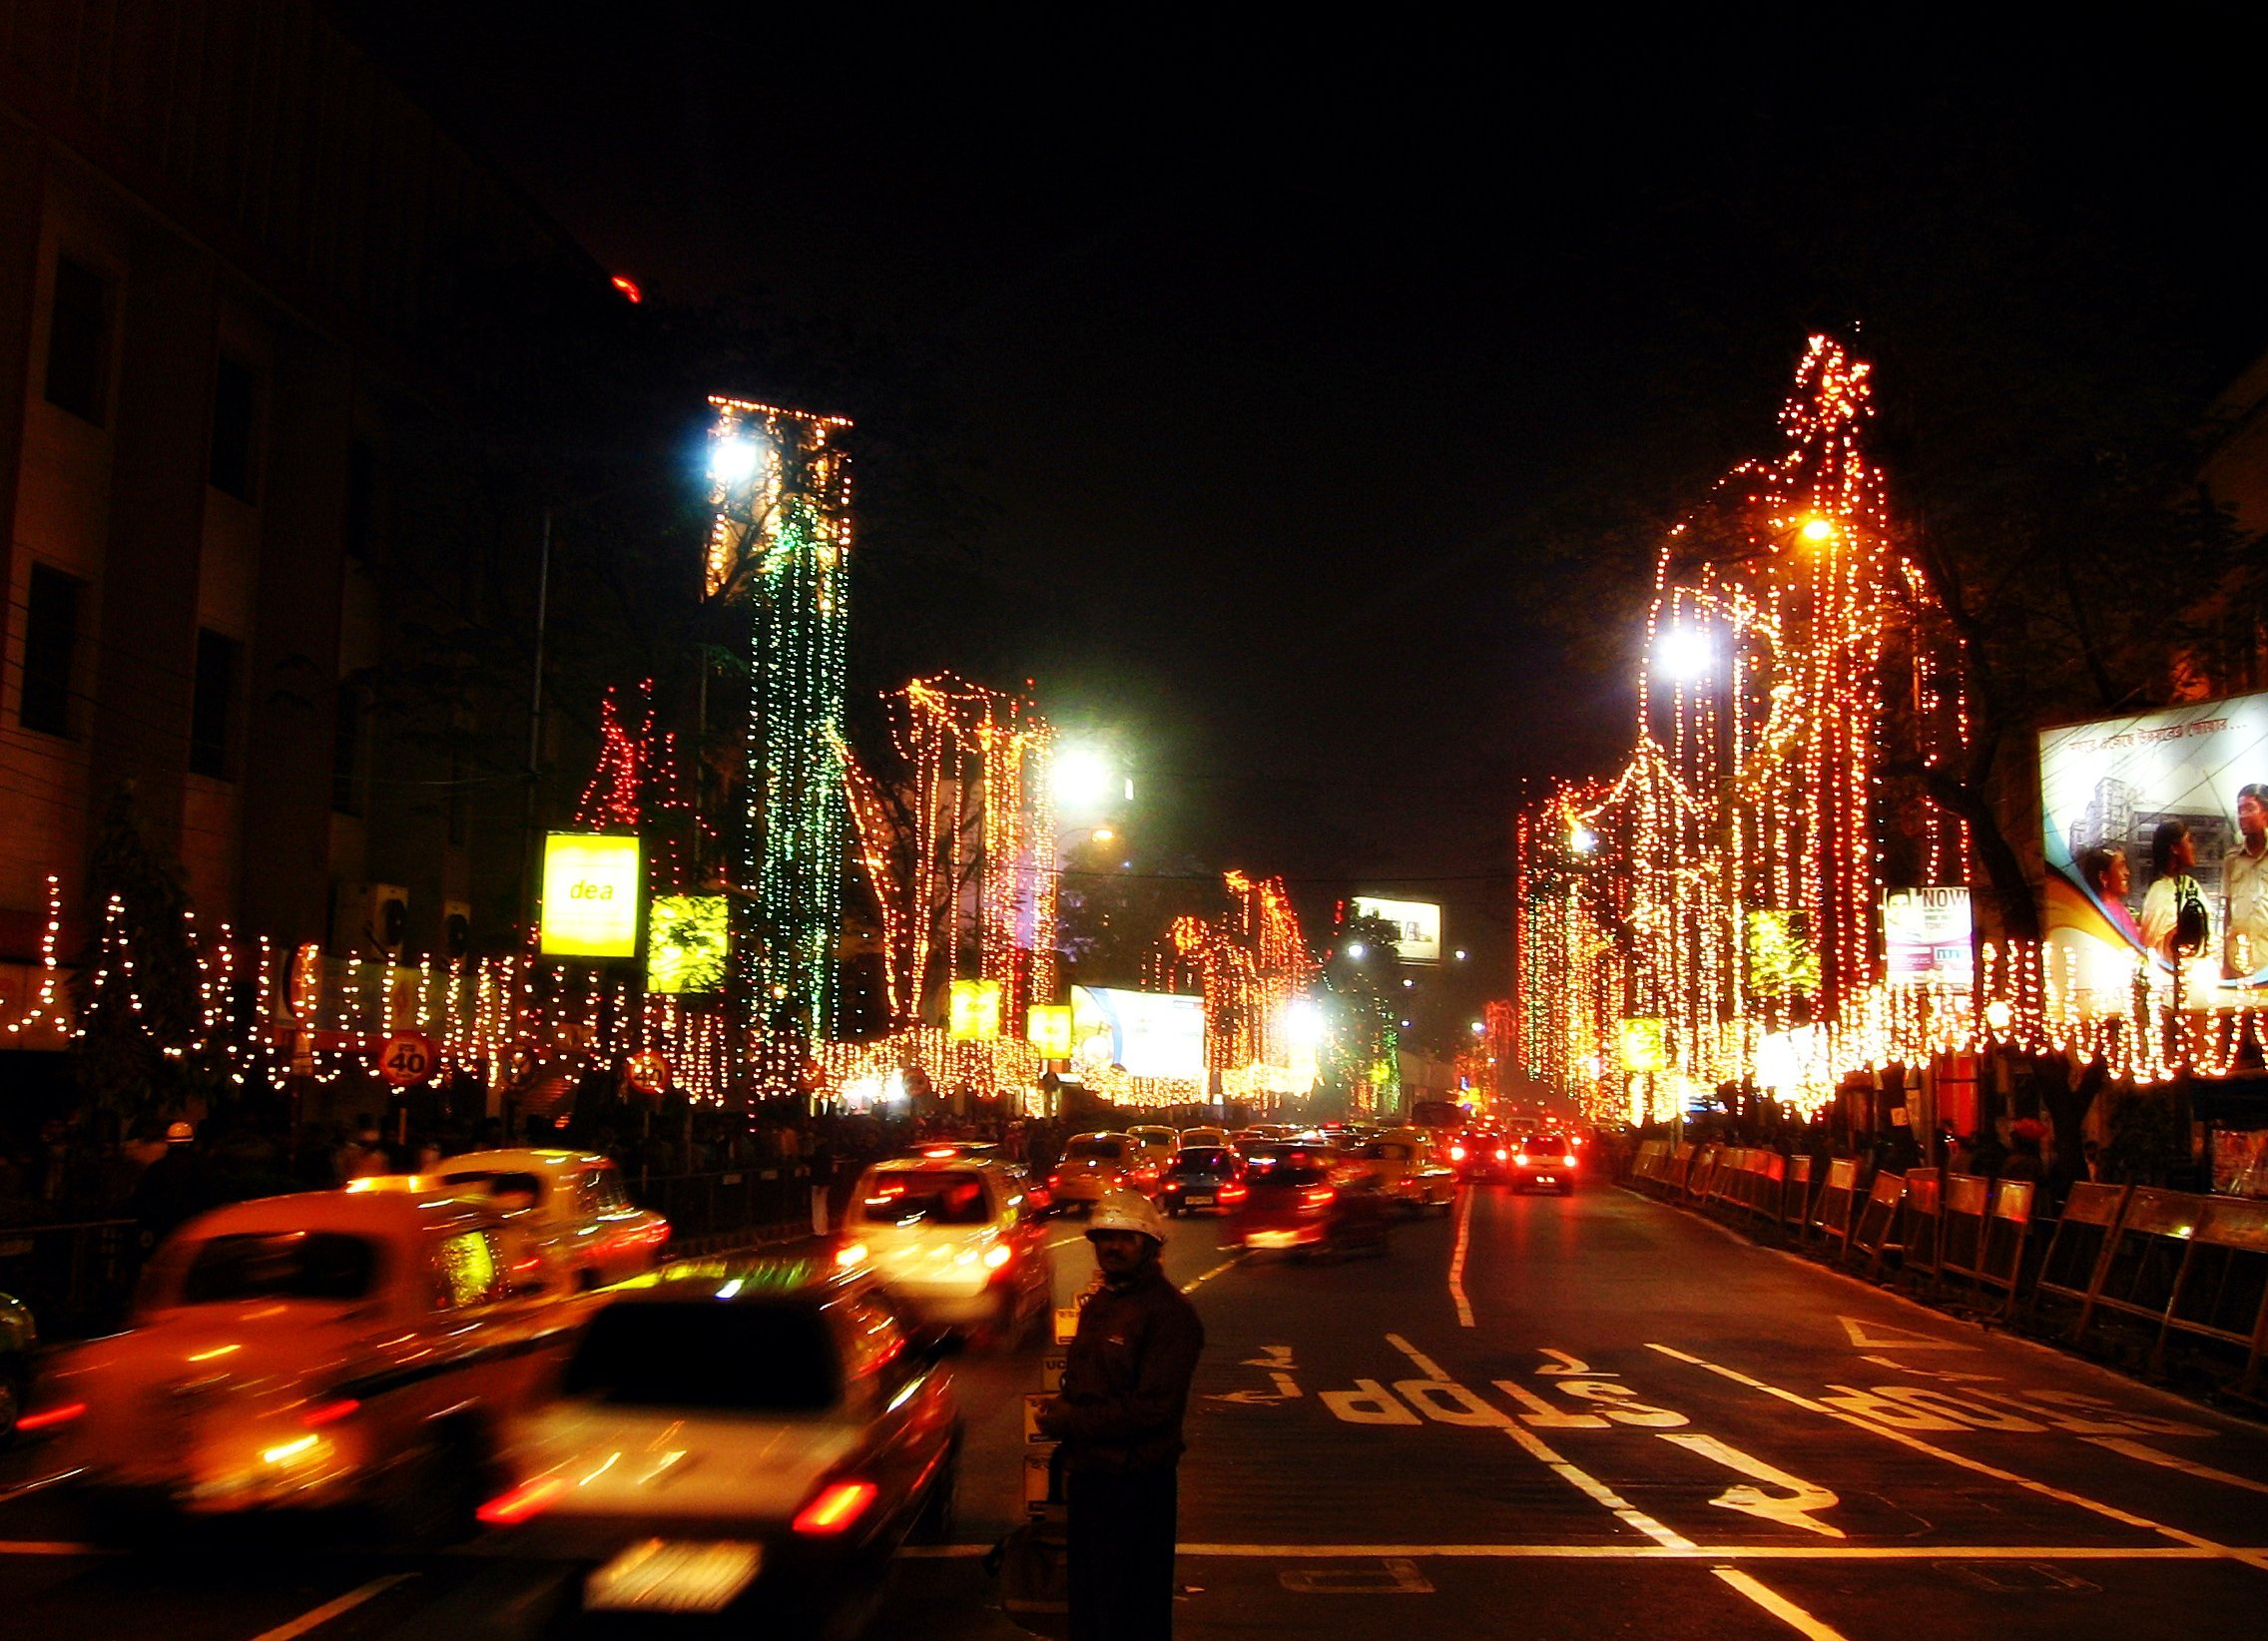 Park Street Kolkata During Christmas.Photos Park Street In Kolkata Lights Up During Christmas